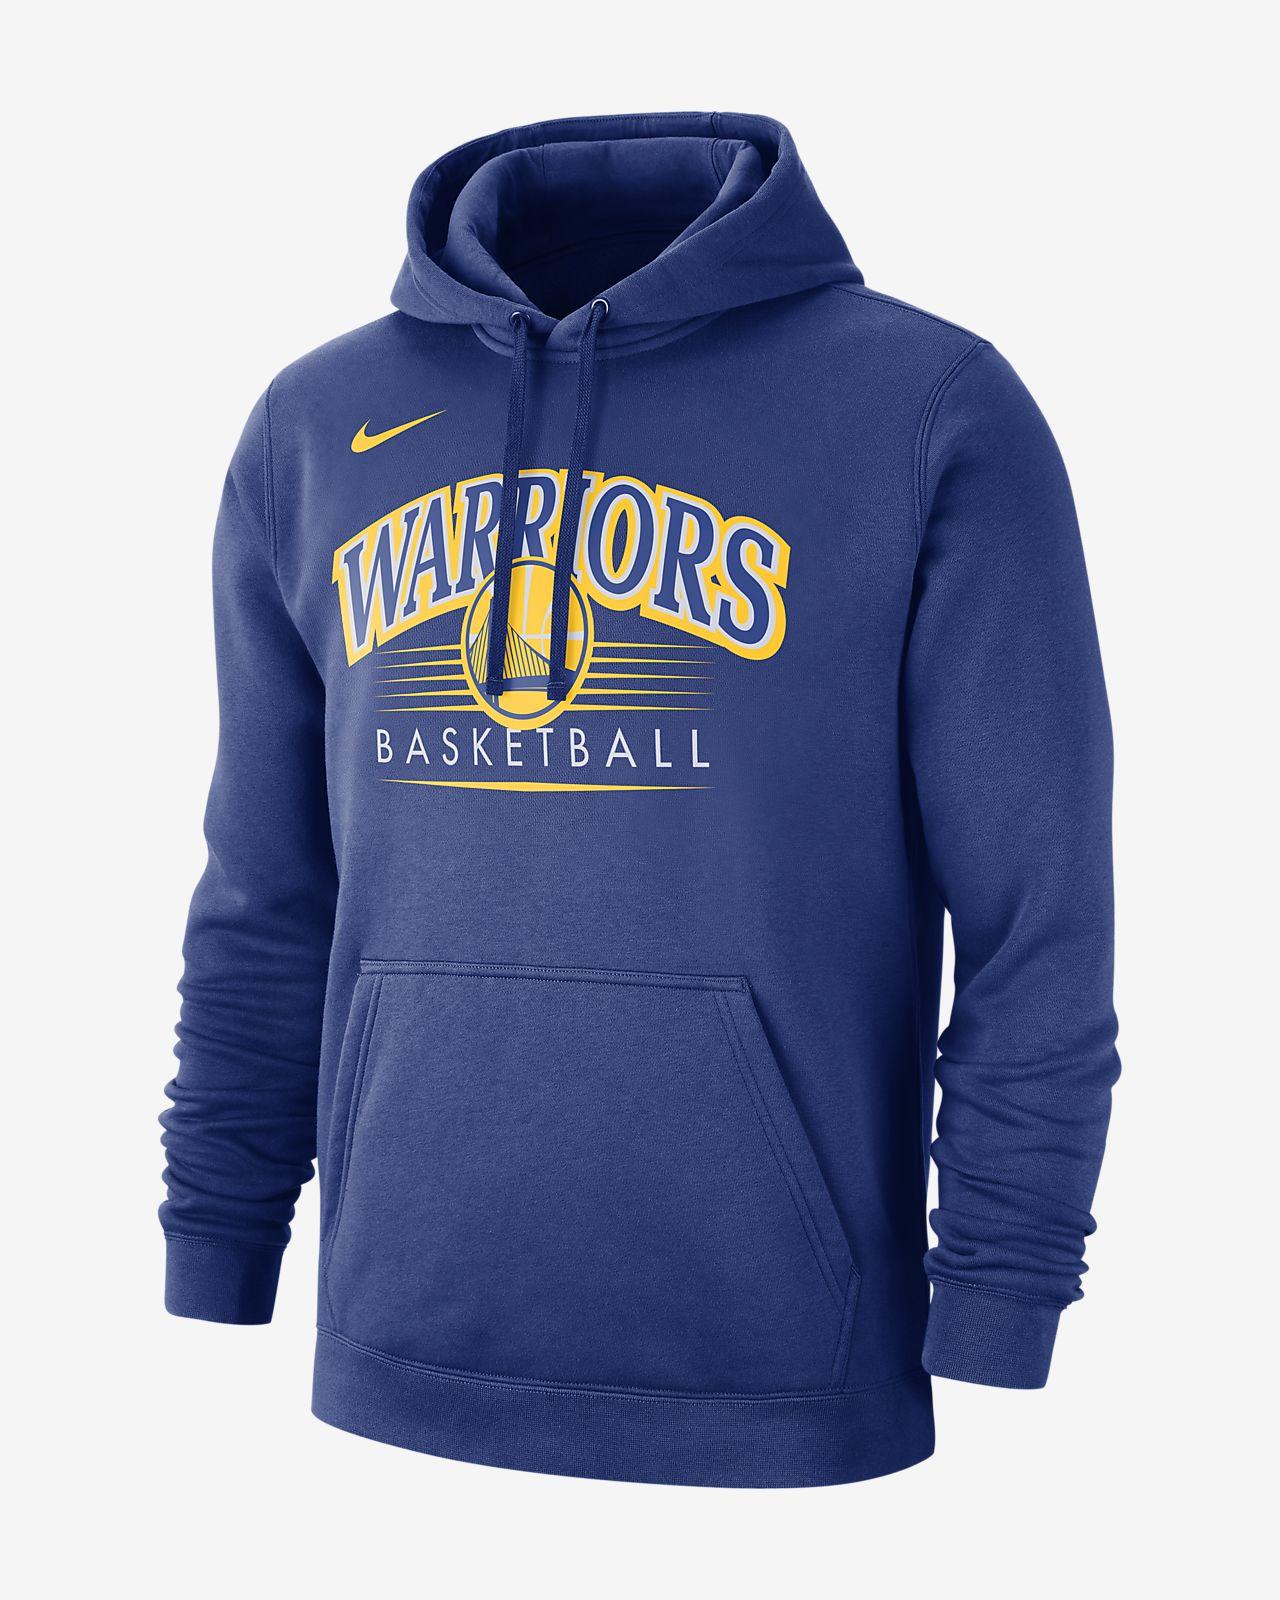 Golden State Warriors Nike NBA-s kapucnis férfipulóver